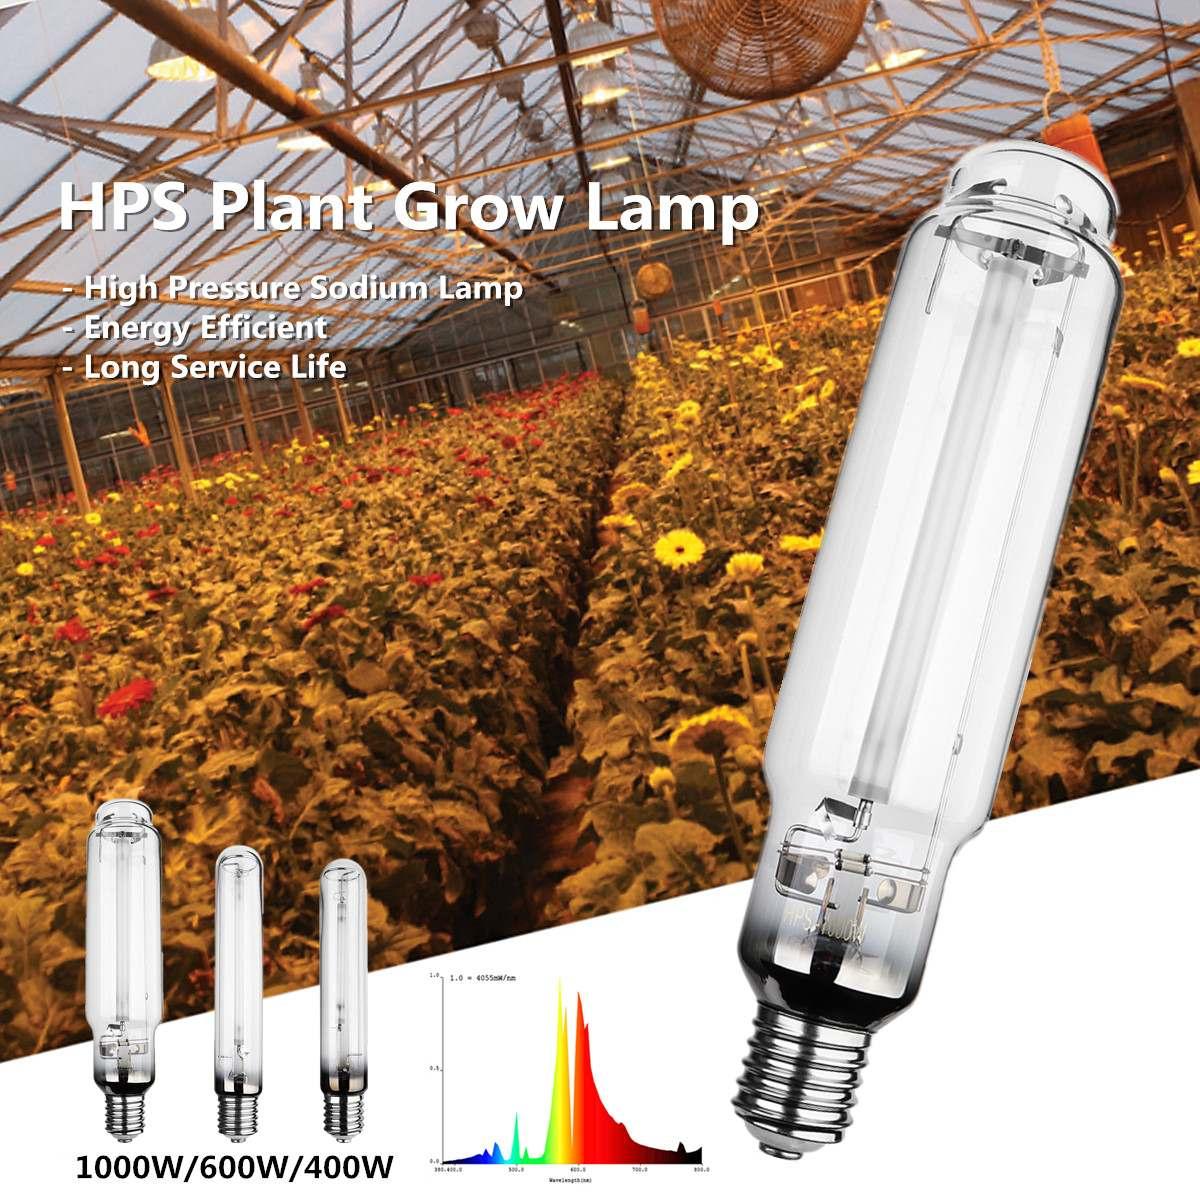 400W 600W 1000W HPS Plant Grow Lamp E40 23Ra High Pressure Sodium Lamp Energy Efficient Long Service Life 23000 Hours